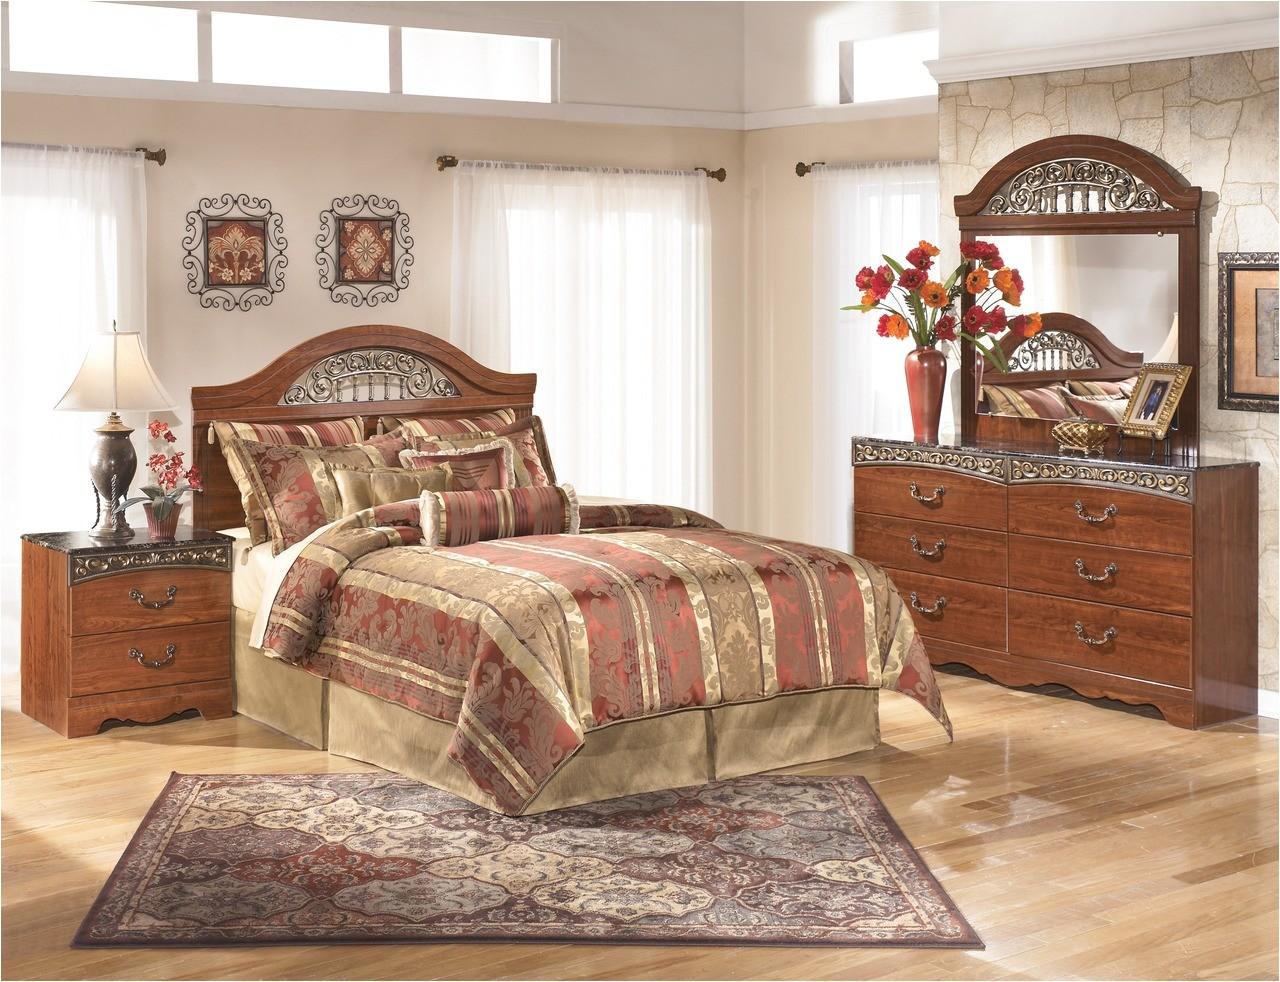 3 piece bedroom set b105 hb detail